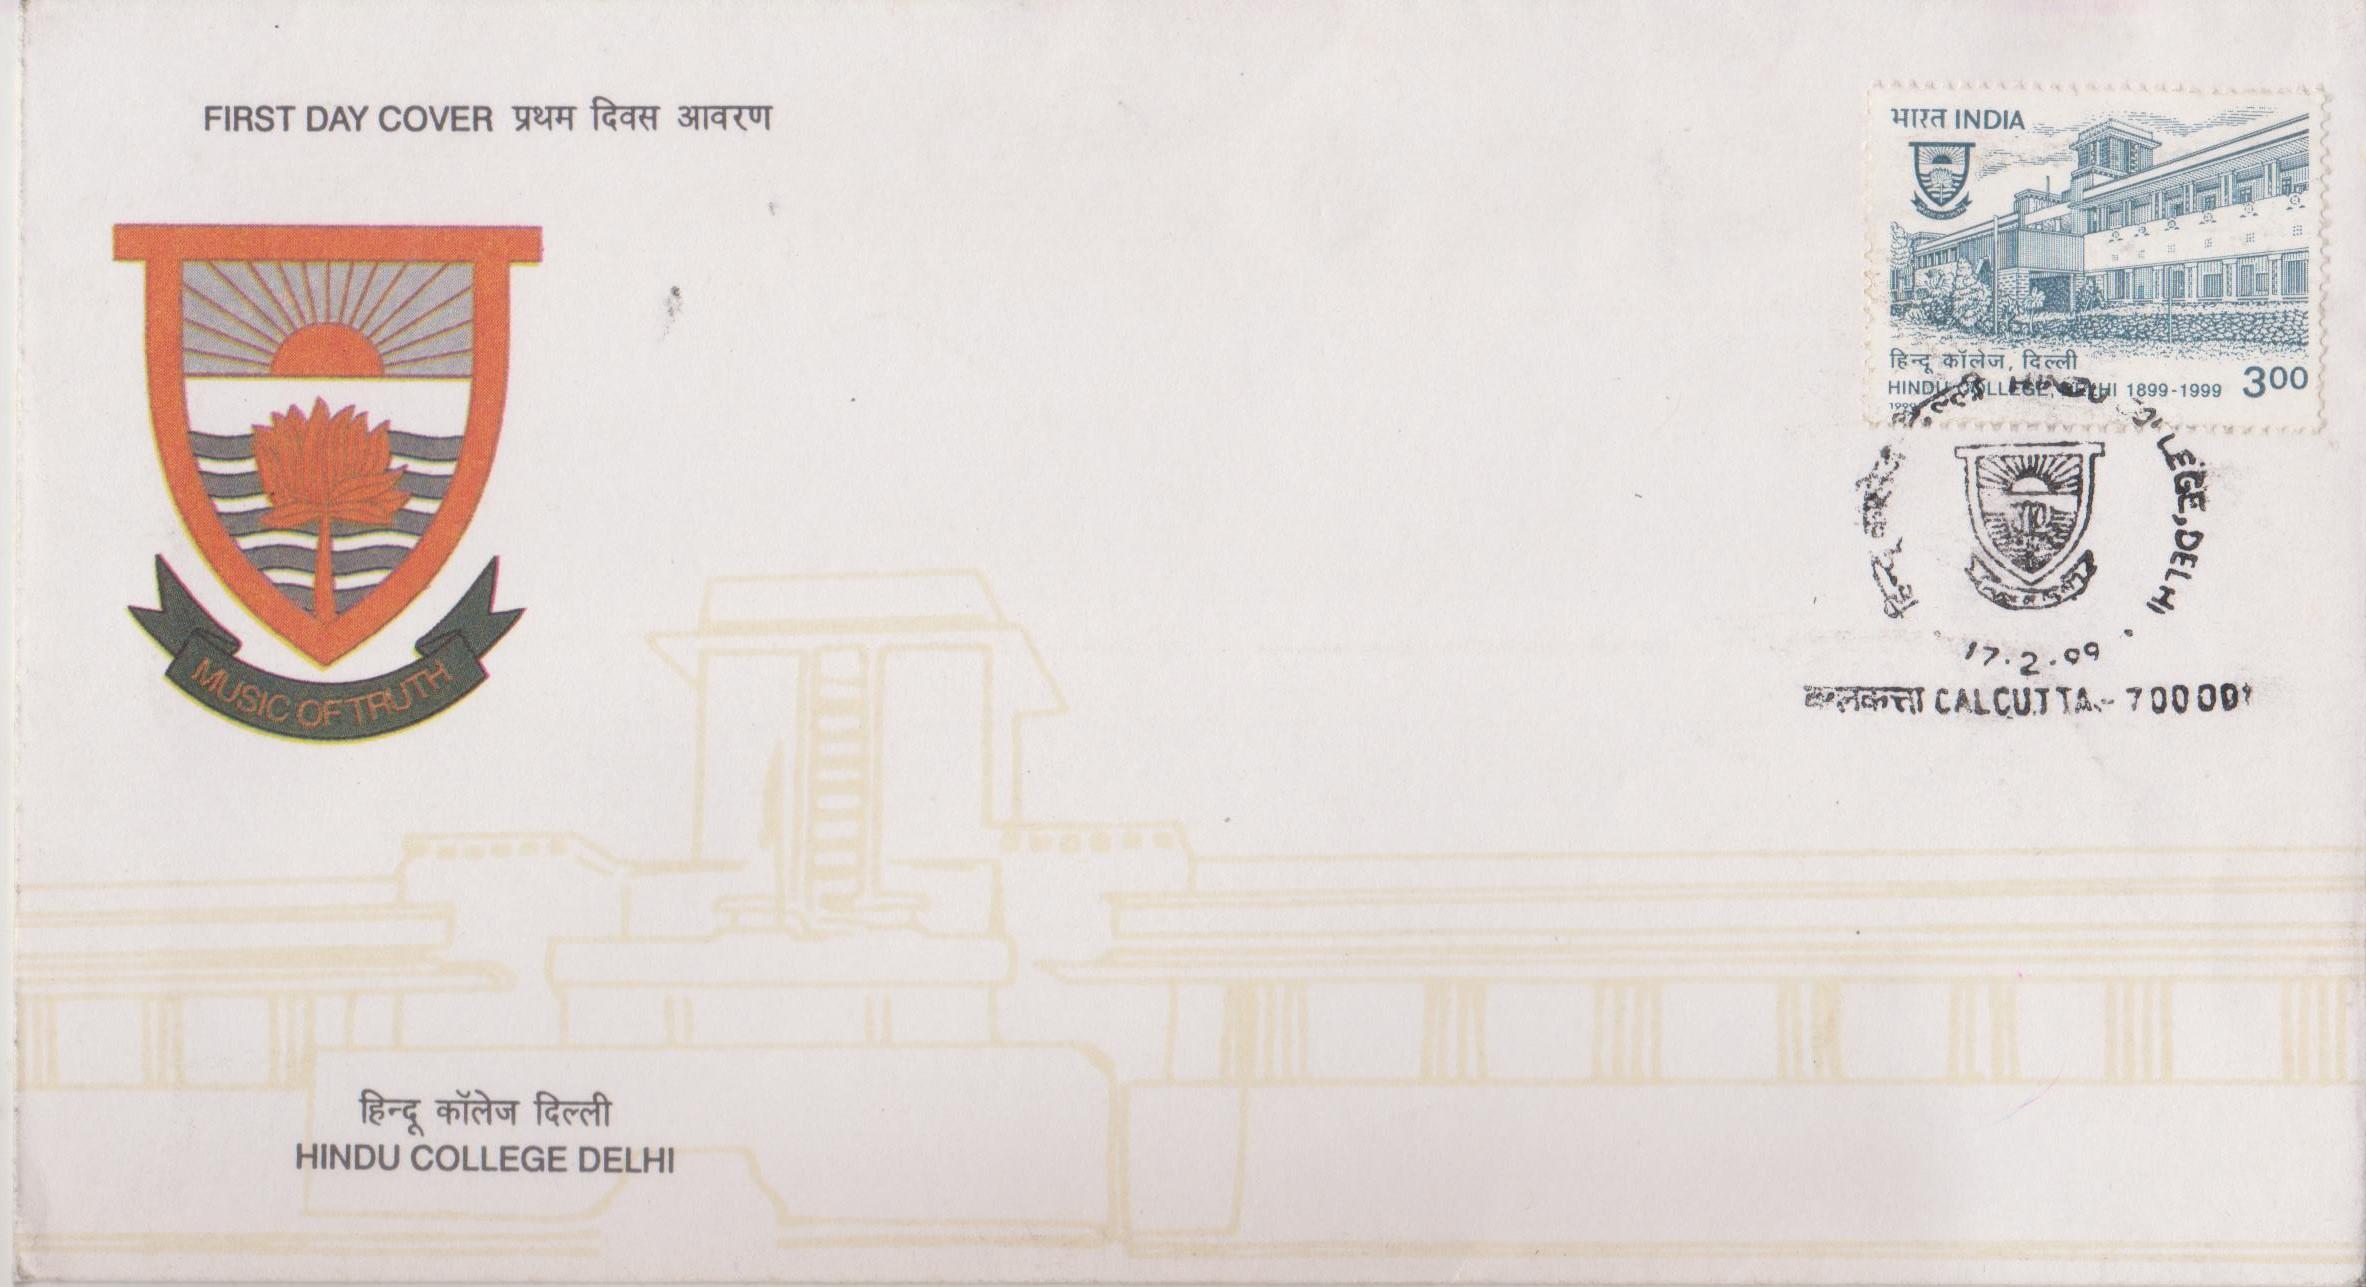 University of Delhi, higher education